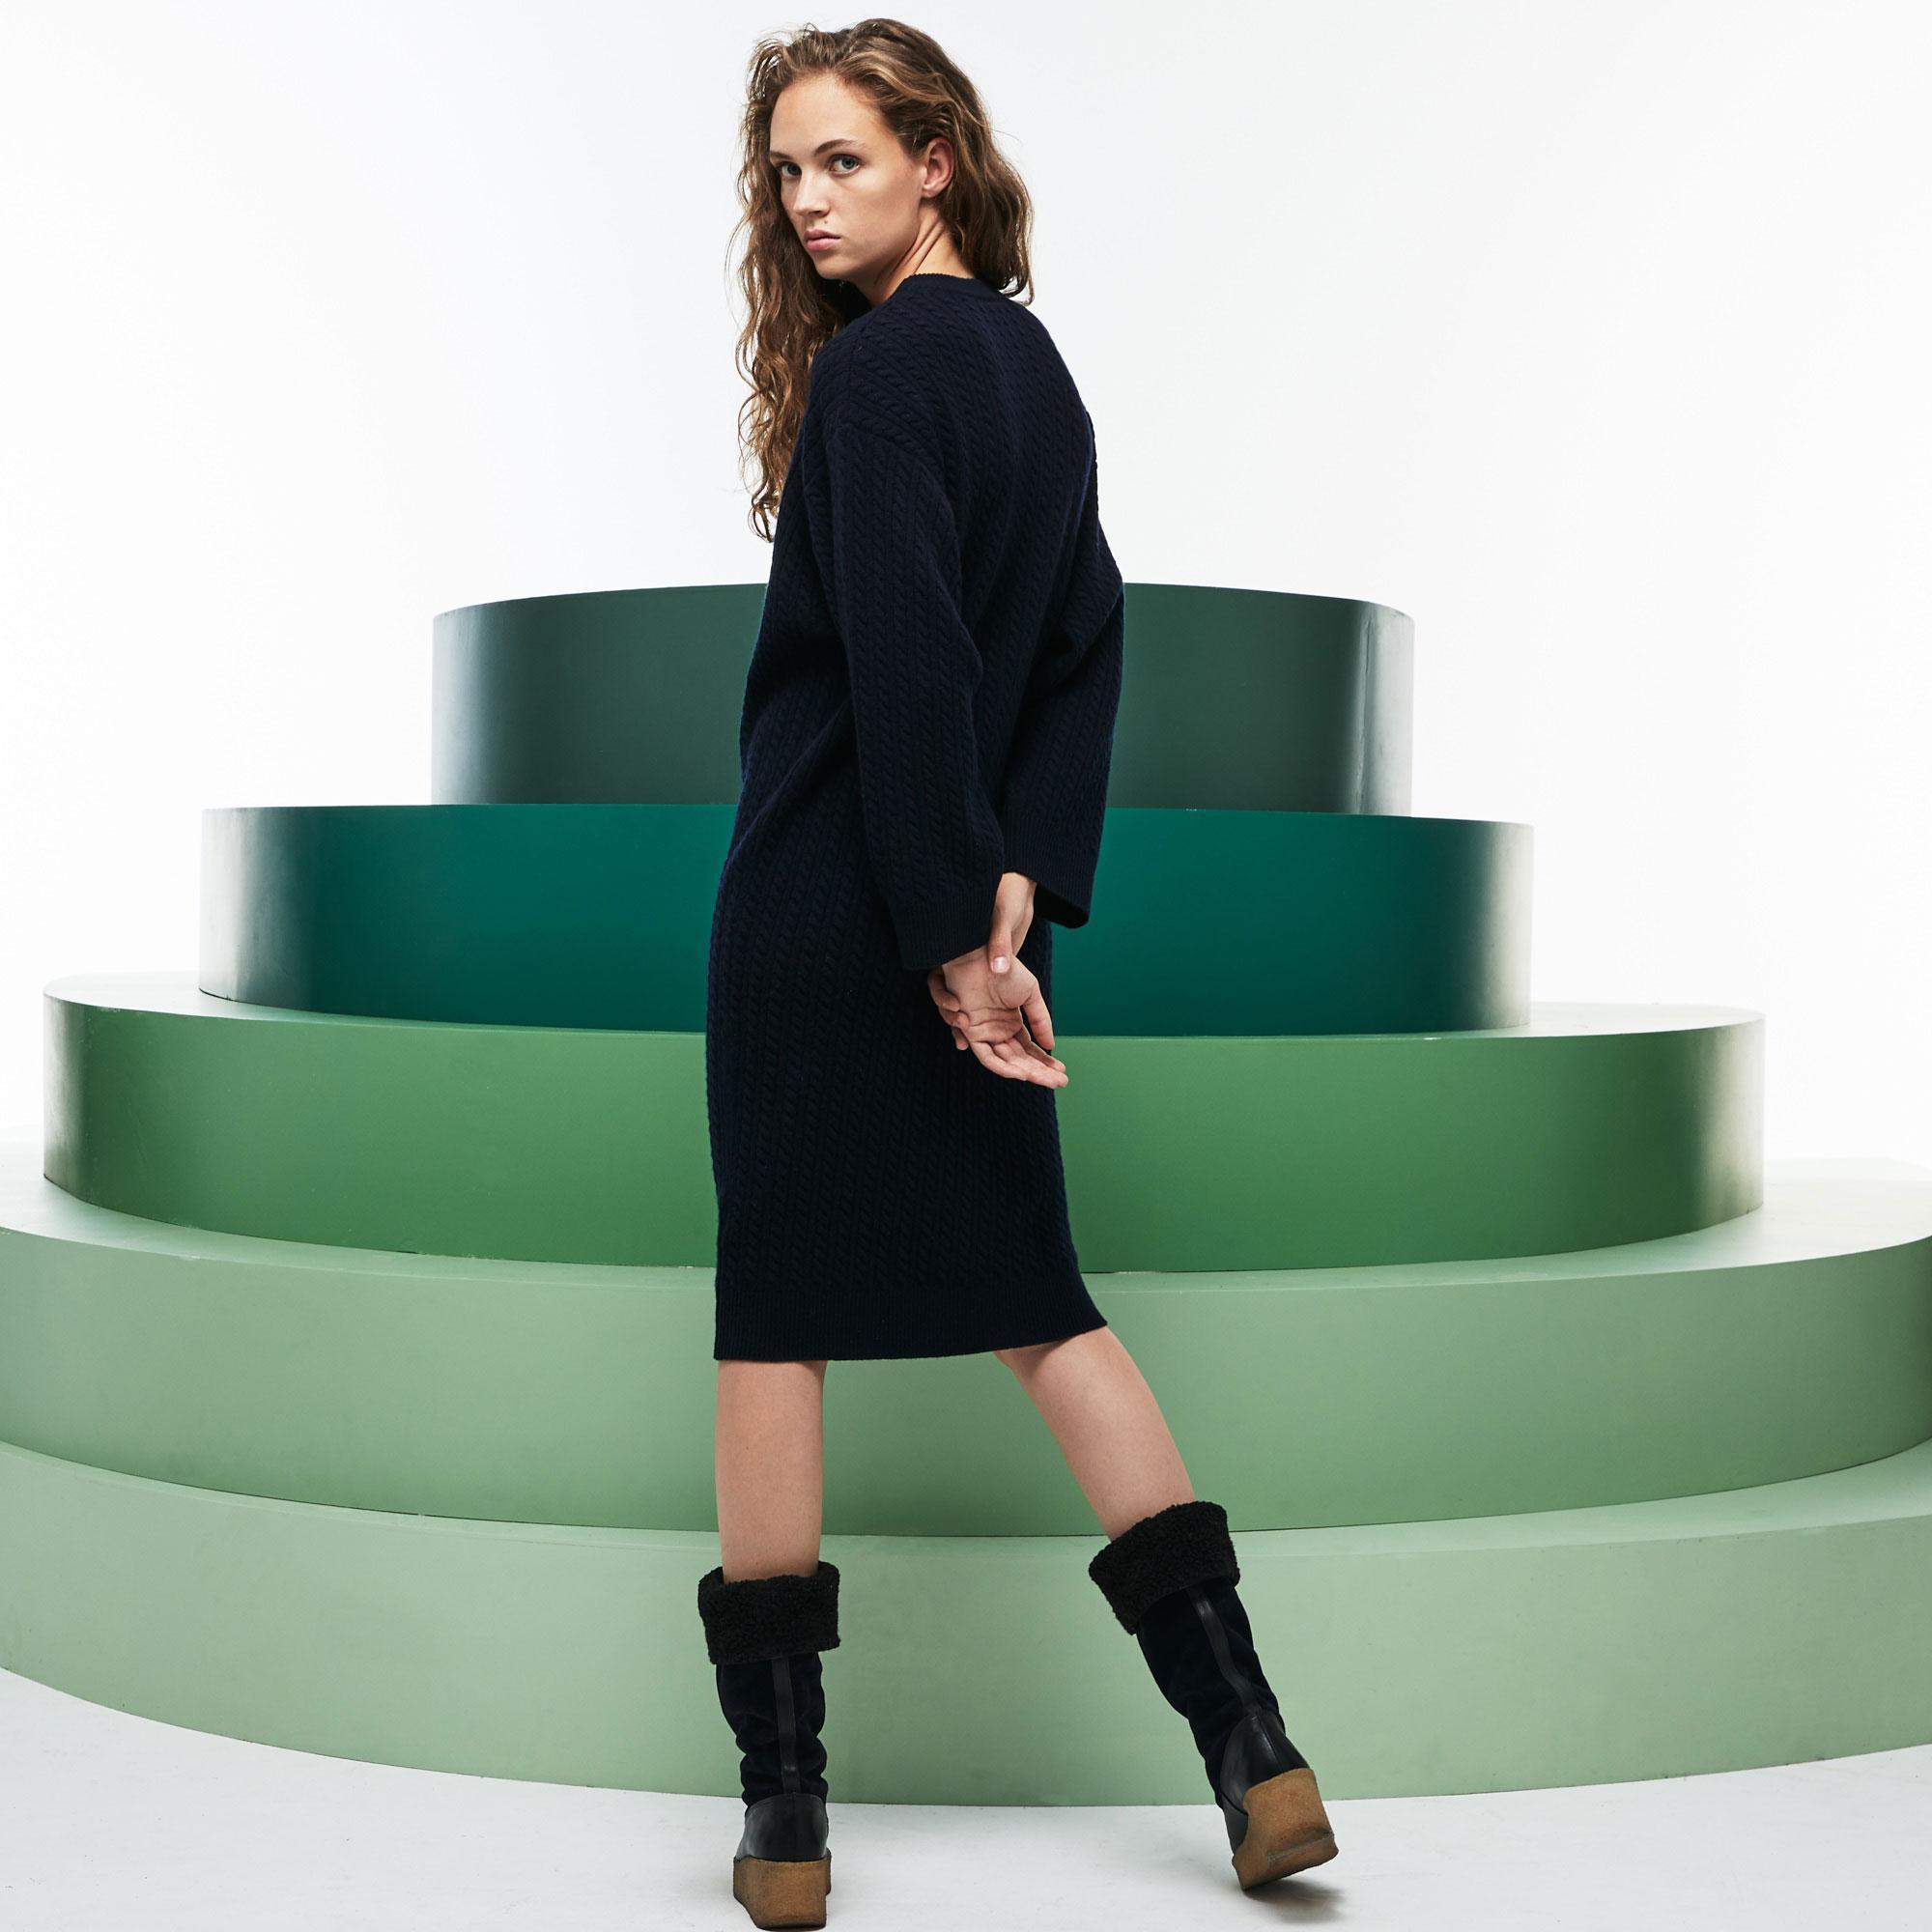 Lacoste Kadın Fashion Show Lacivert Elbise